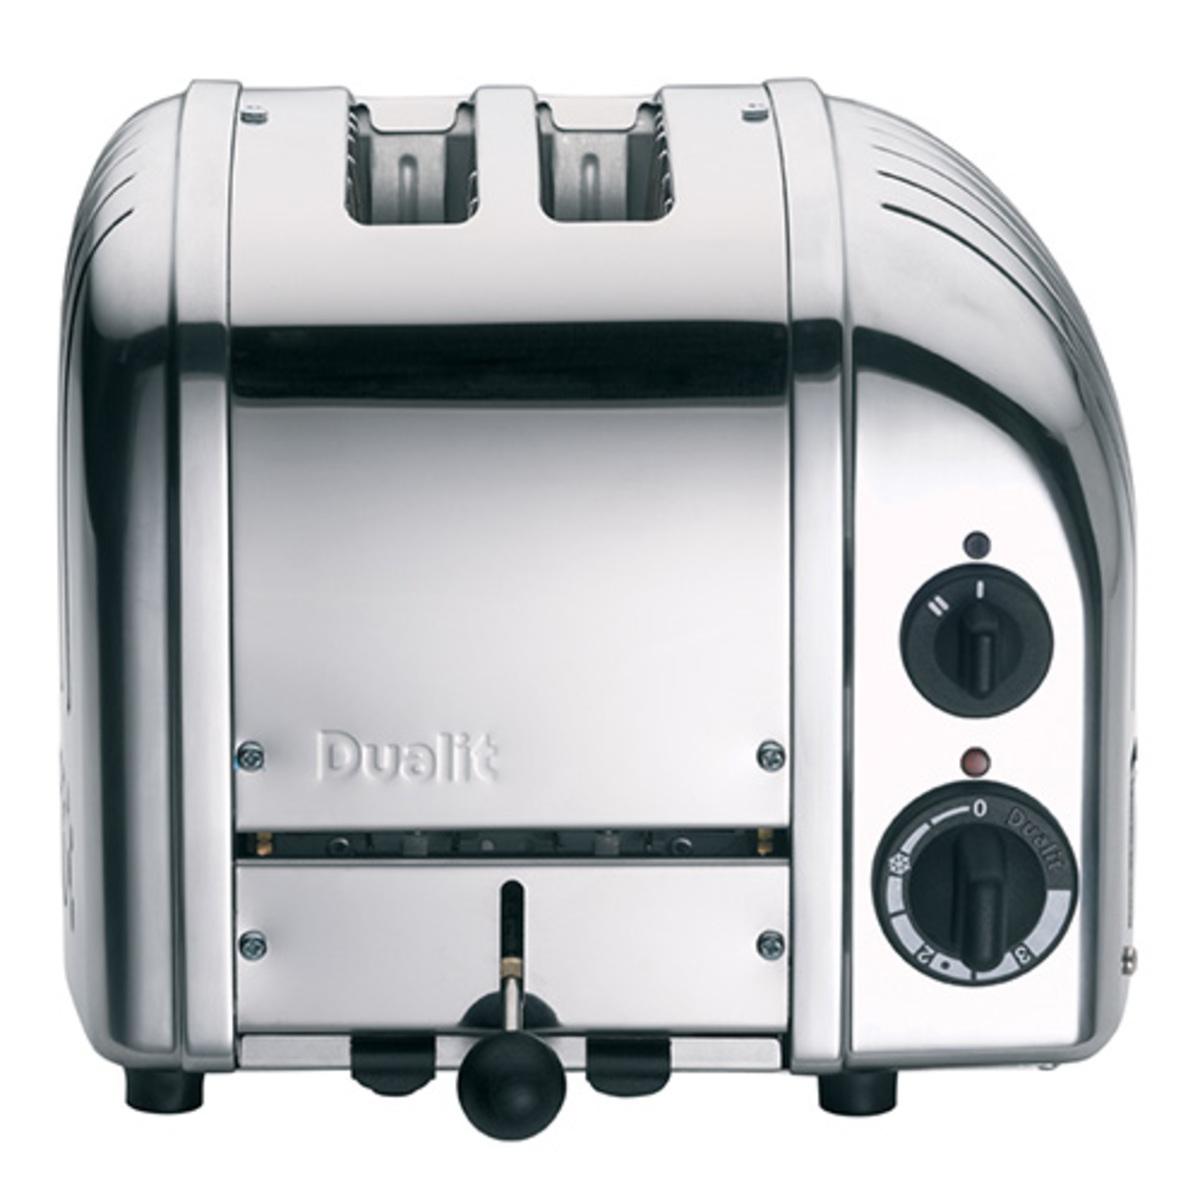 Image of Dualit 20441 Classic Vario AWS 2 Slot Toaster, Polished